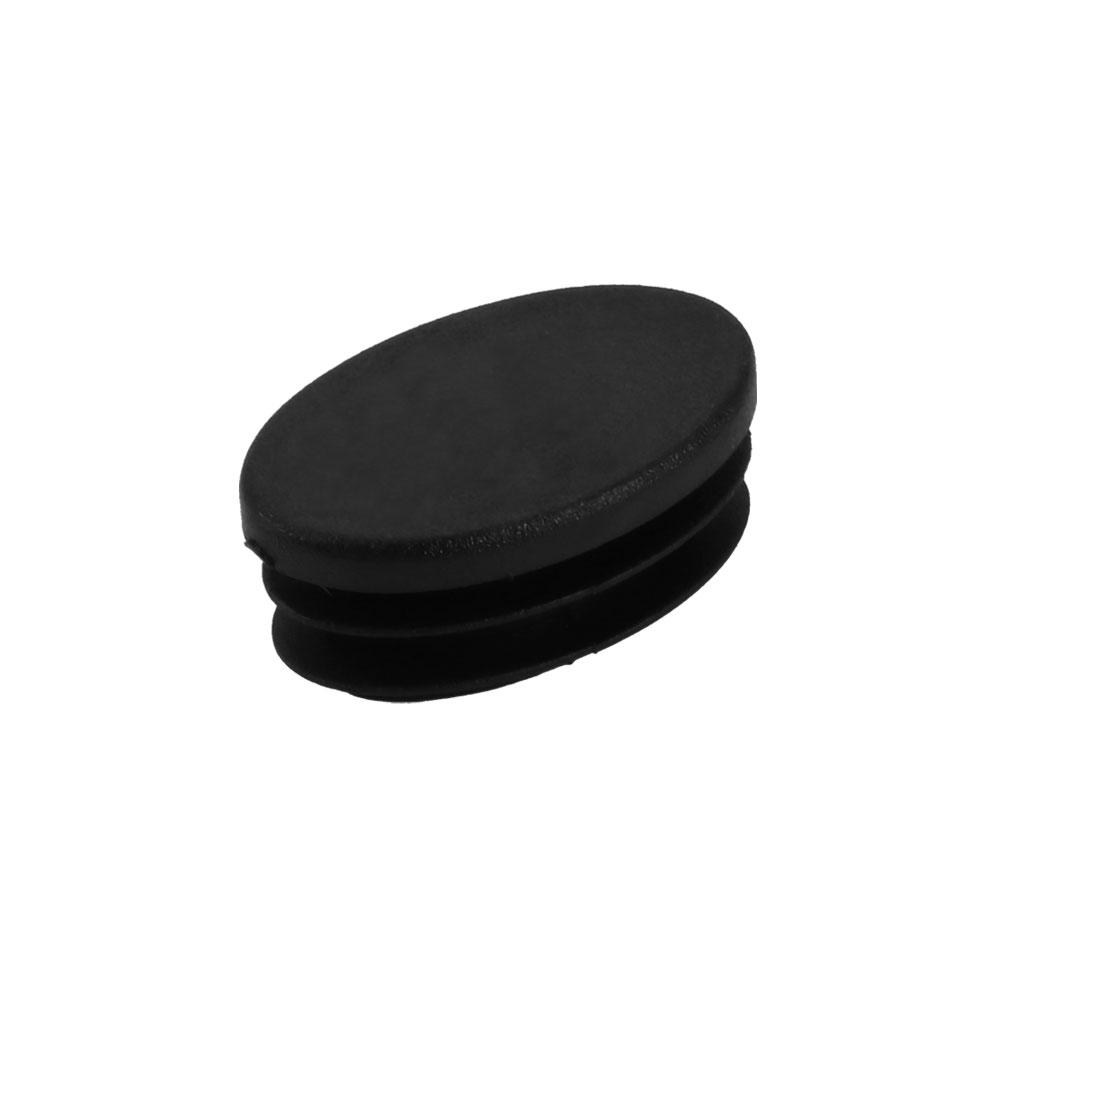 Furniture Foot Protector Desk Chair Oval Leg Tip Cap 42mmx26mmx19mm Black